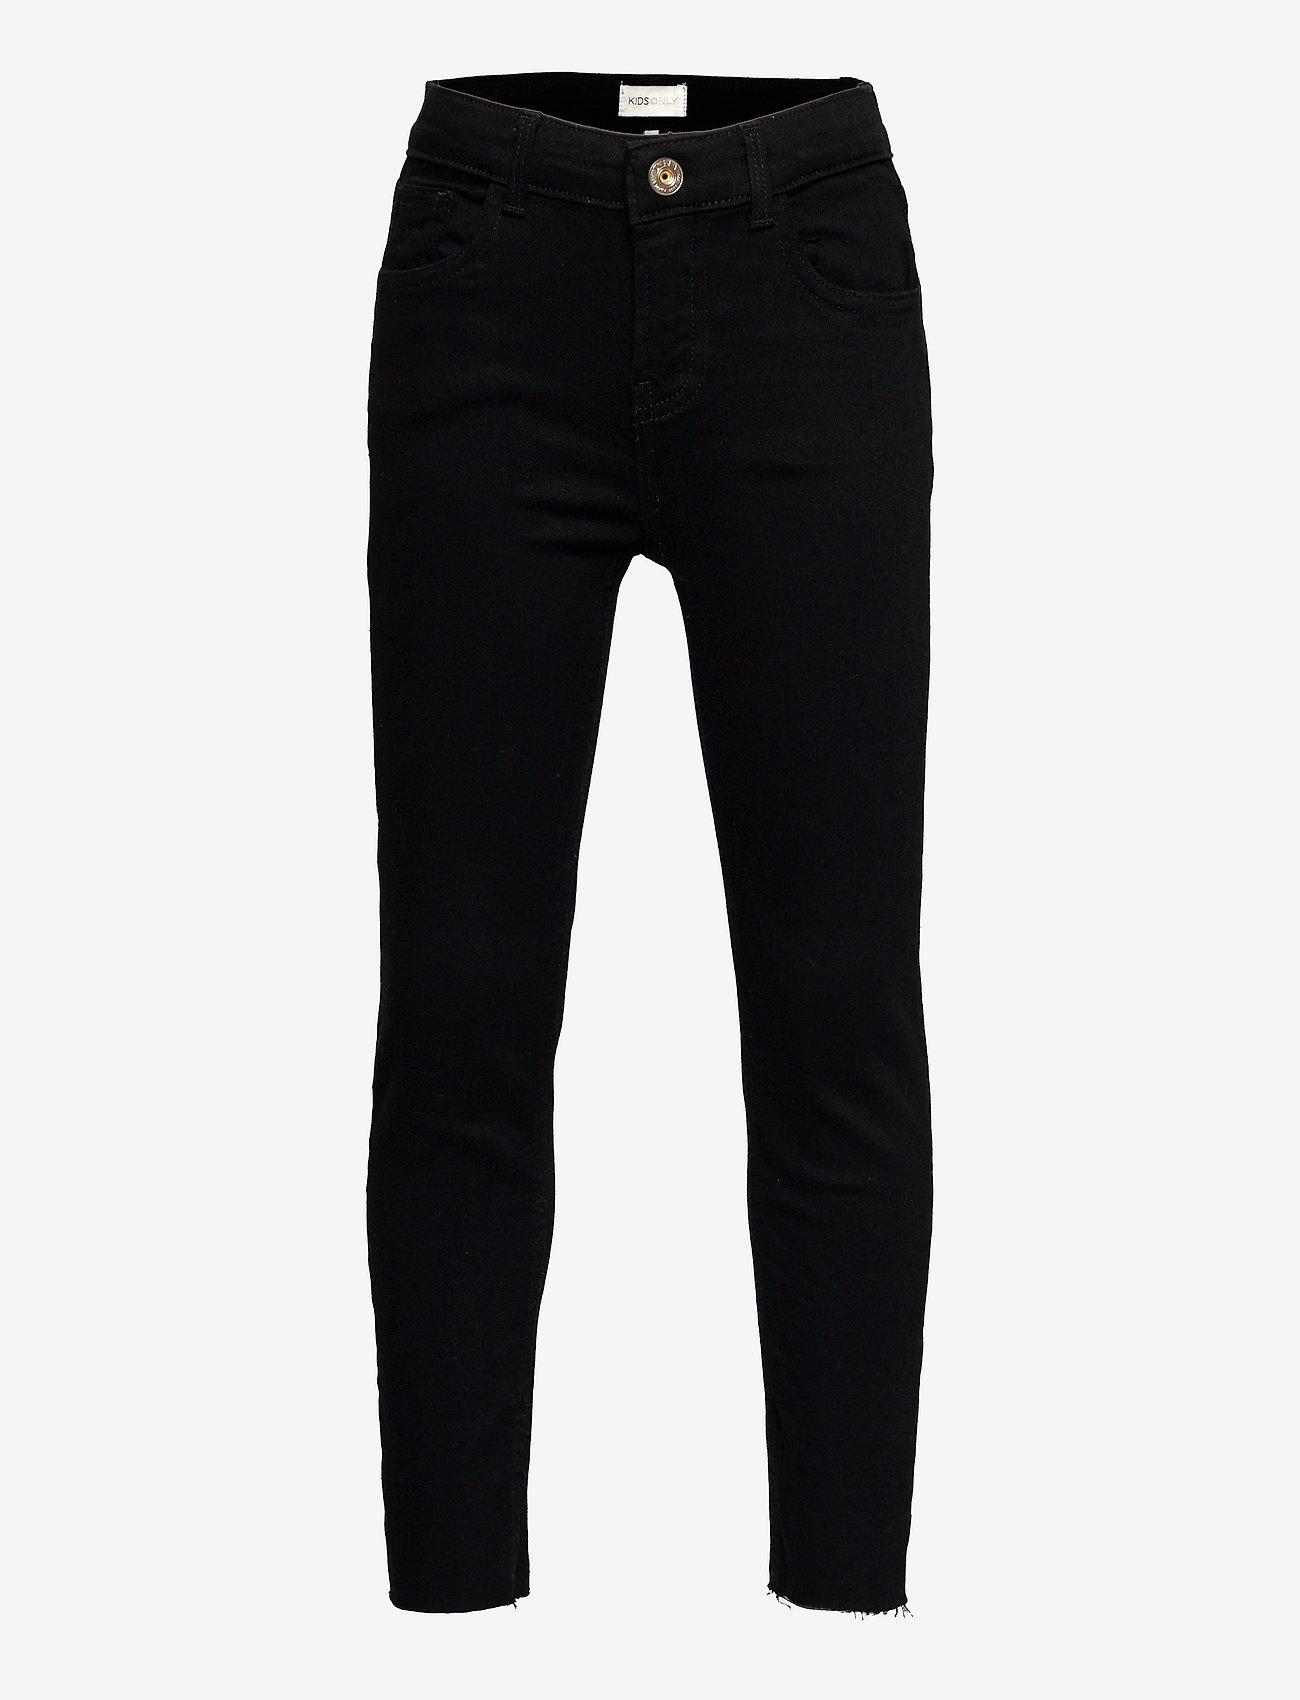 Kids Only - KONEMILY LIFE ST RAW  BLACK JEANS AZG161 - jeans - black - 0